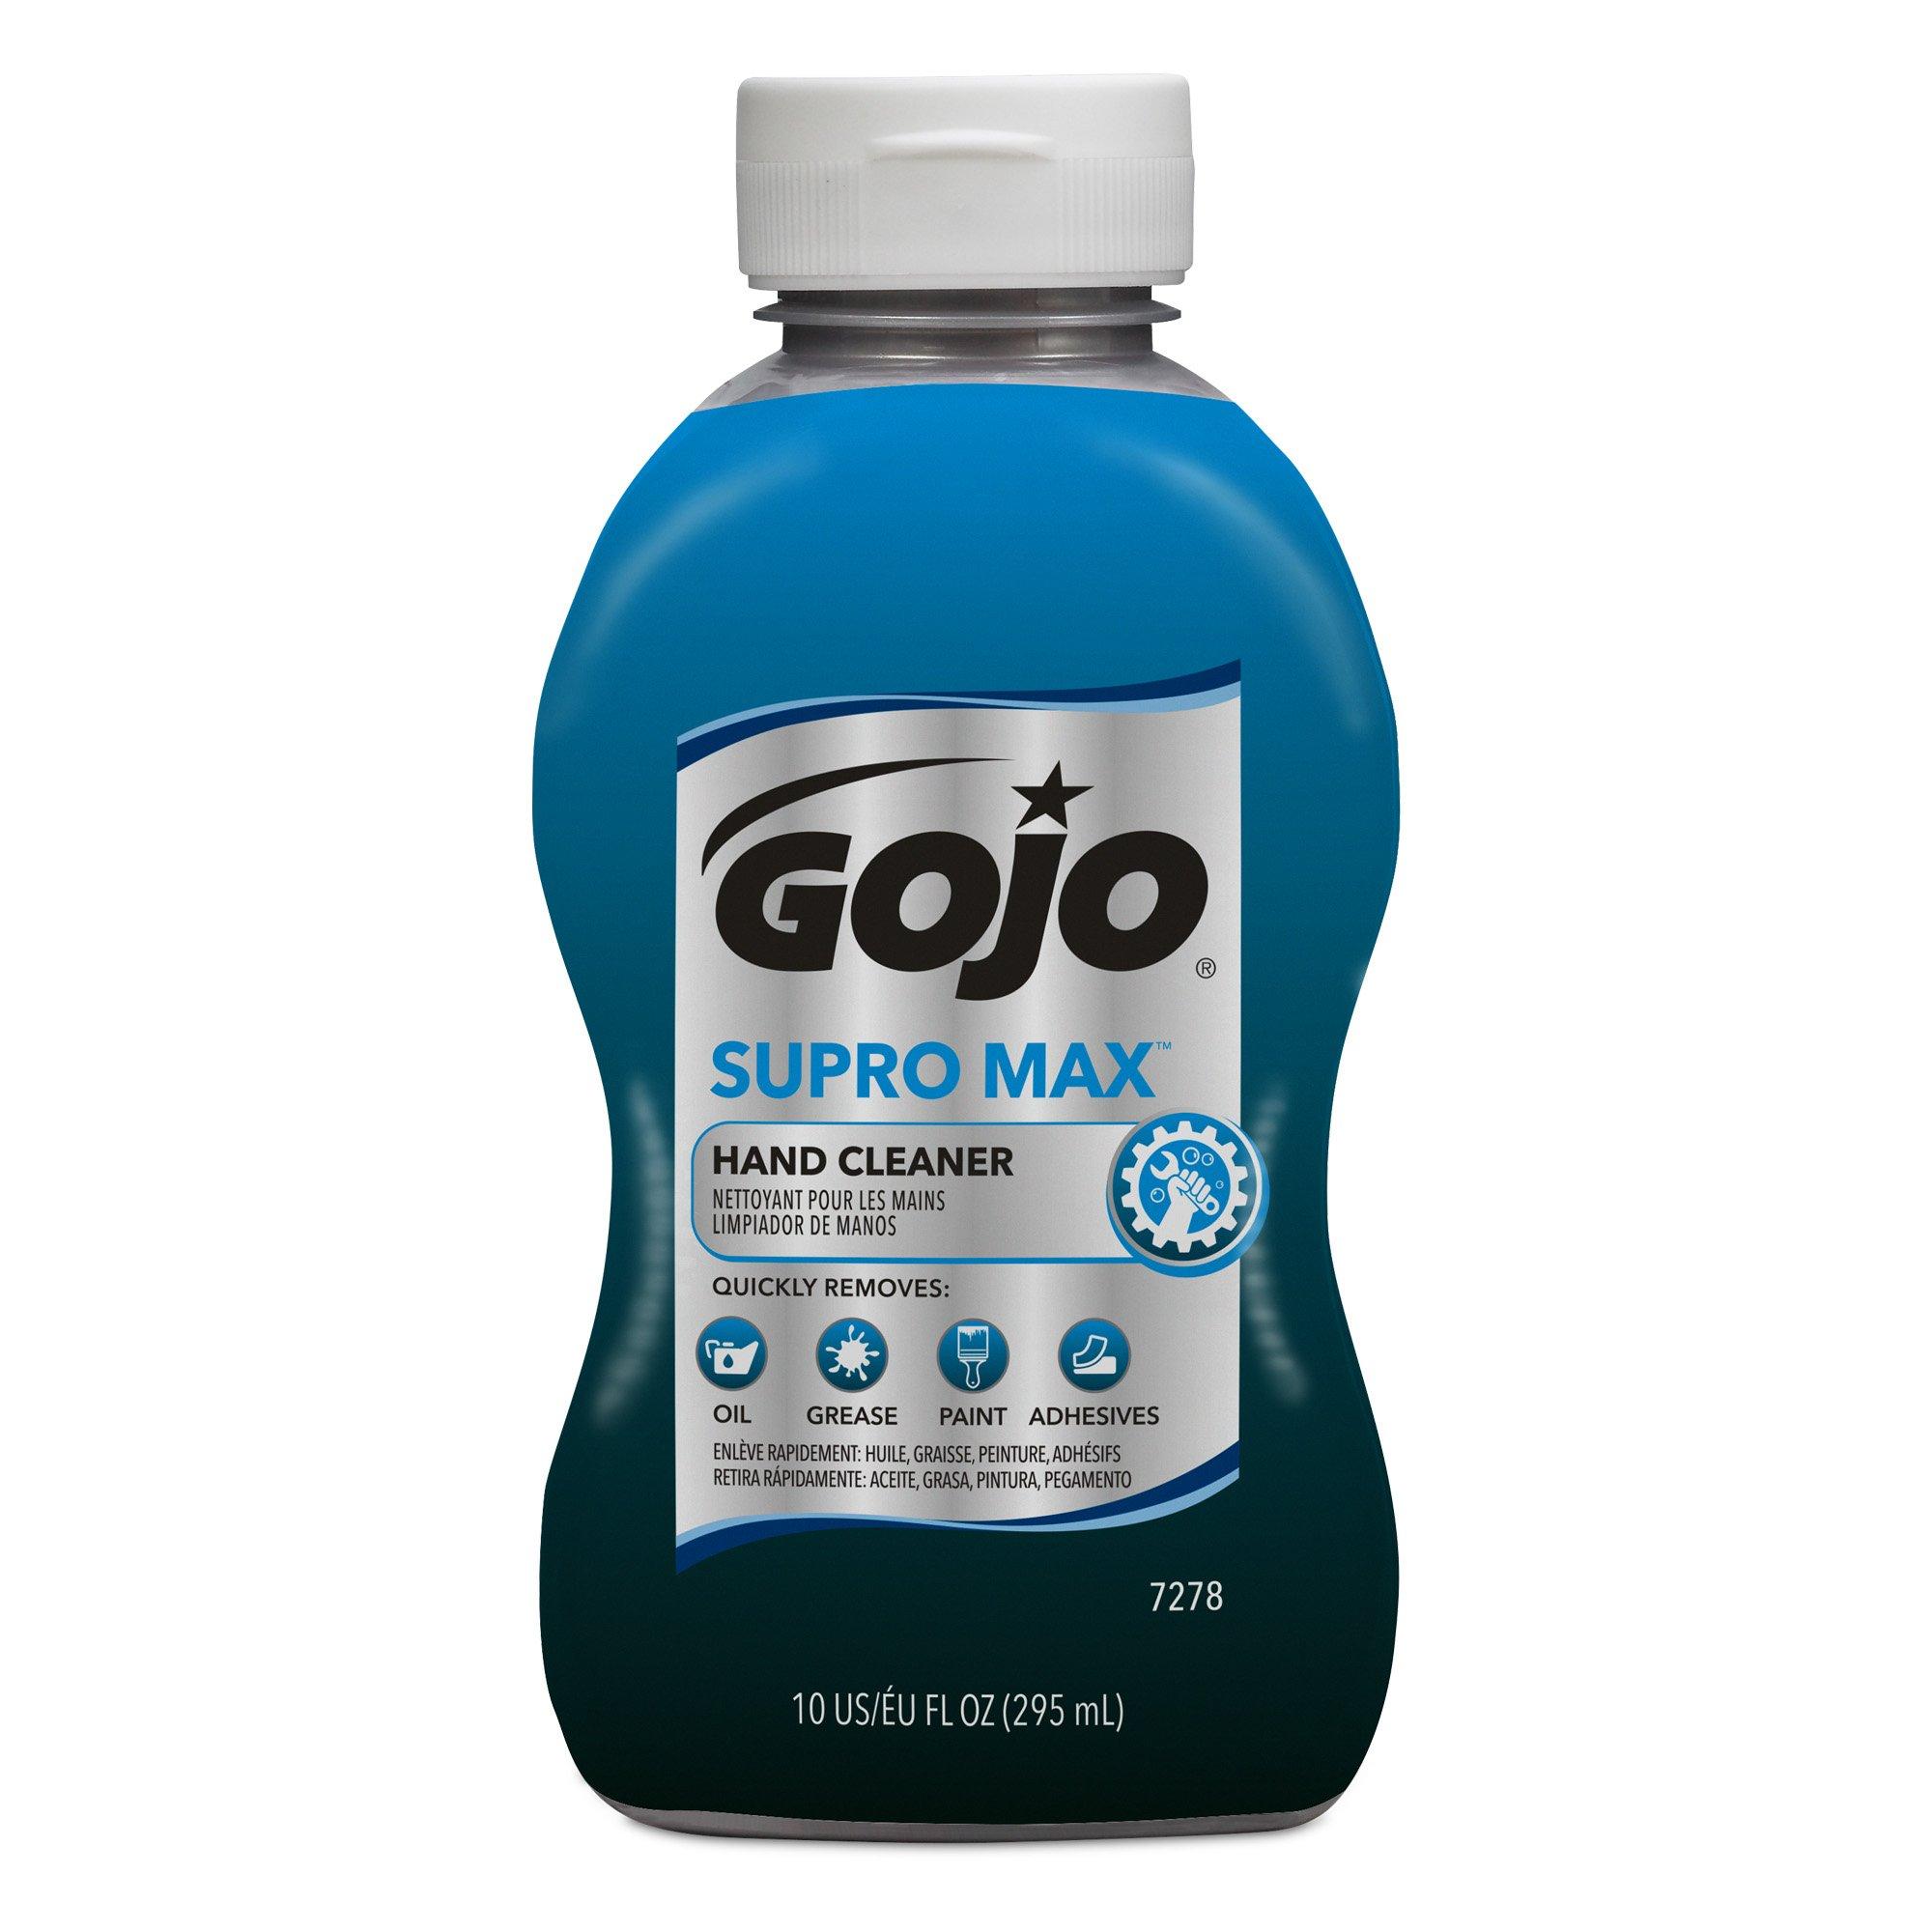 GOJO SUPRO MAX(TM) Hand Cleaner - 10 fl oz Bottle (Pack of 8)